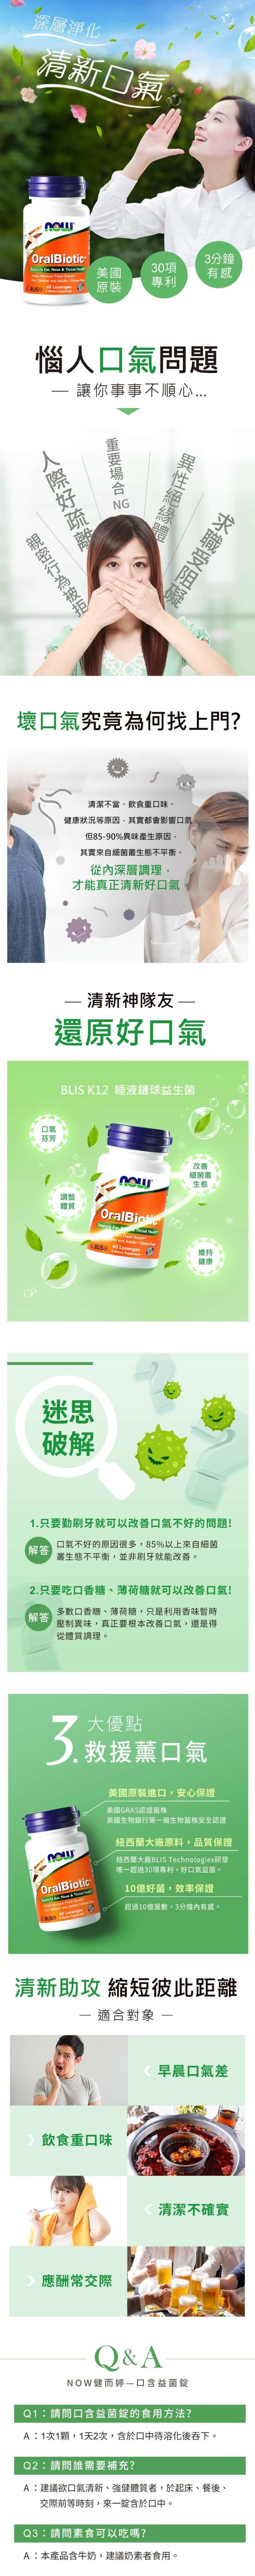 NOW健而婷-口含益菌錠(60顆)產品資訊